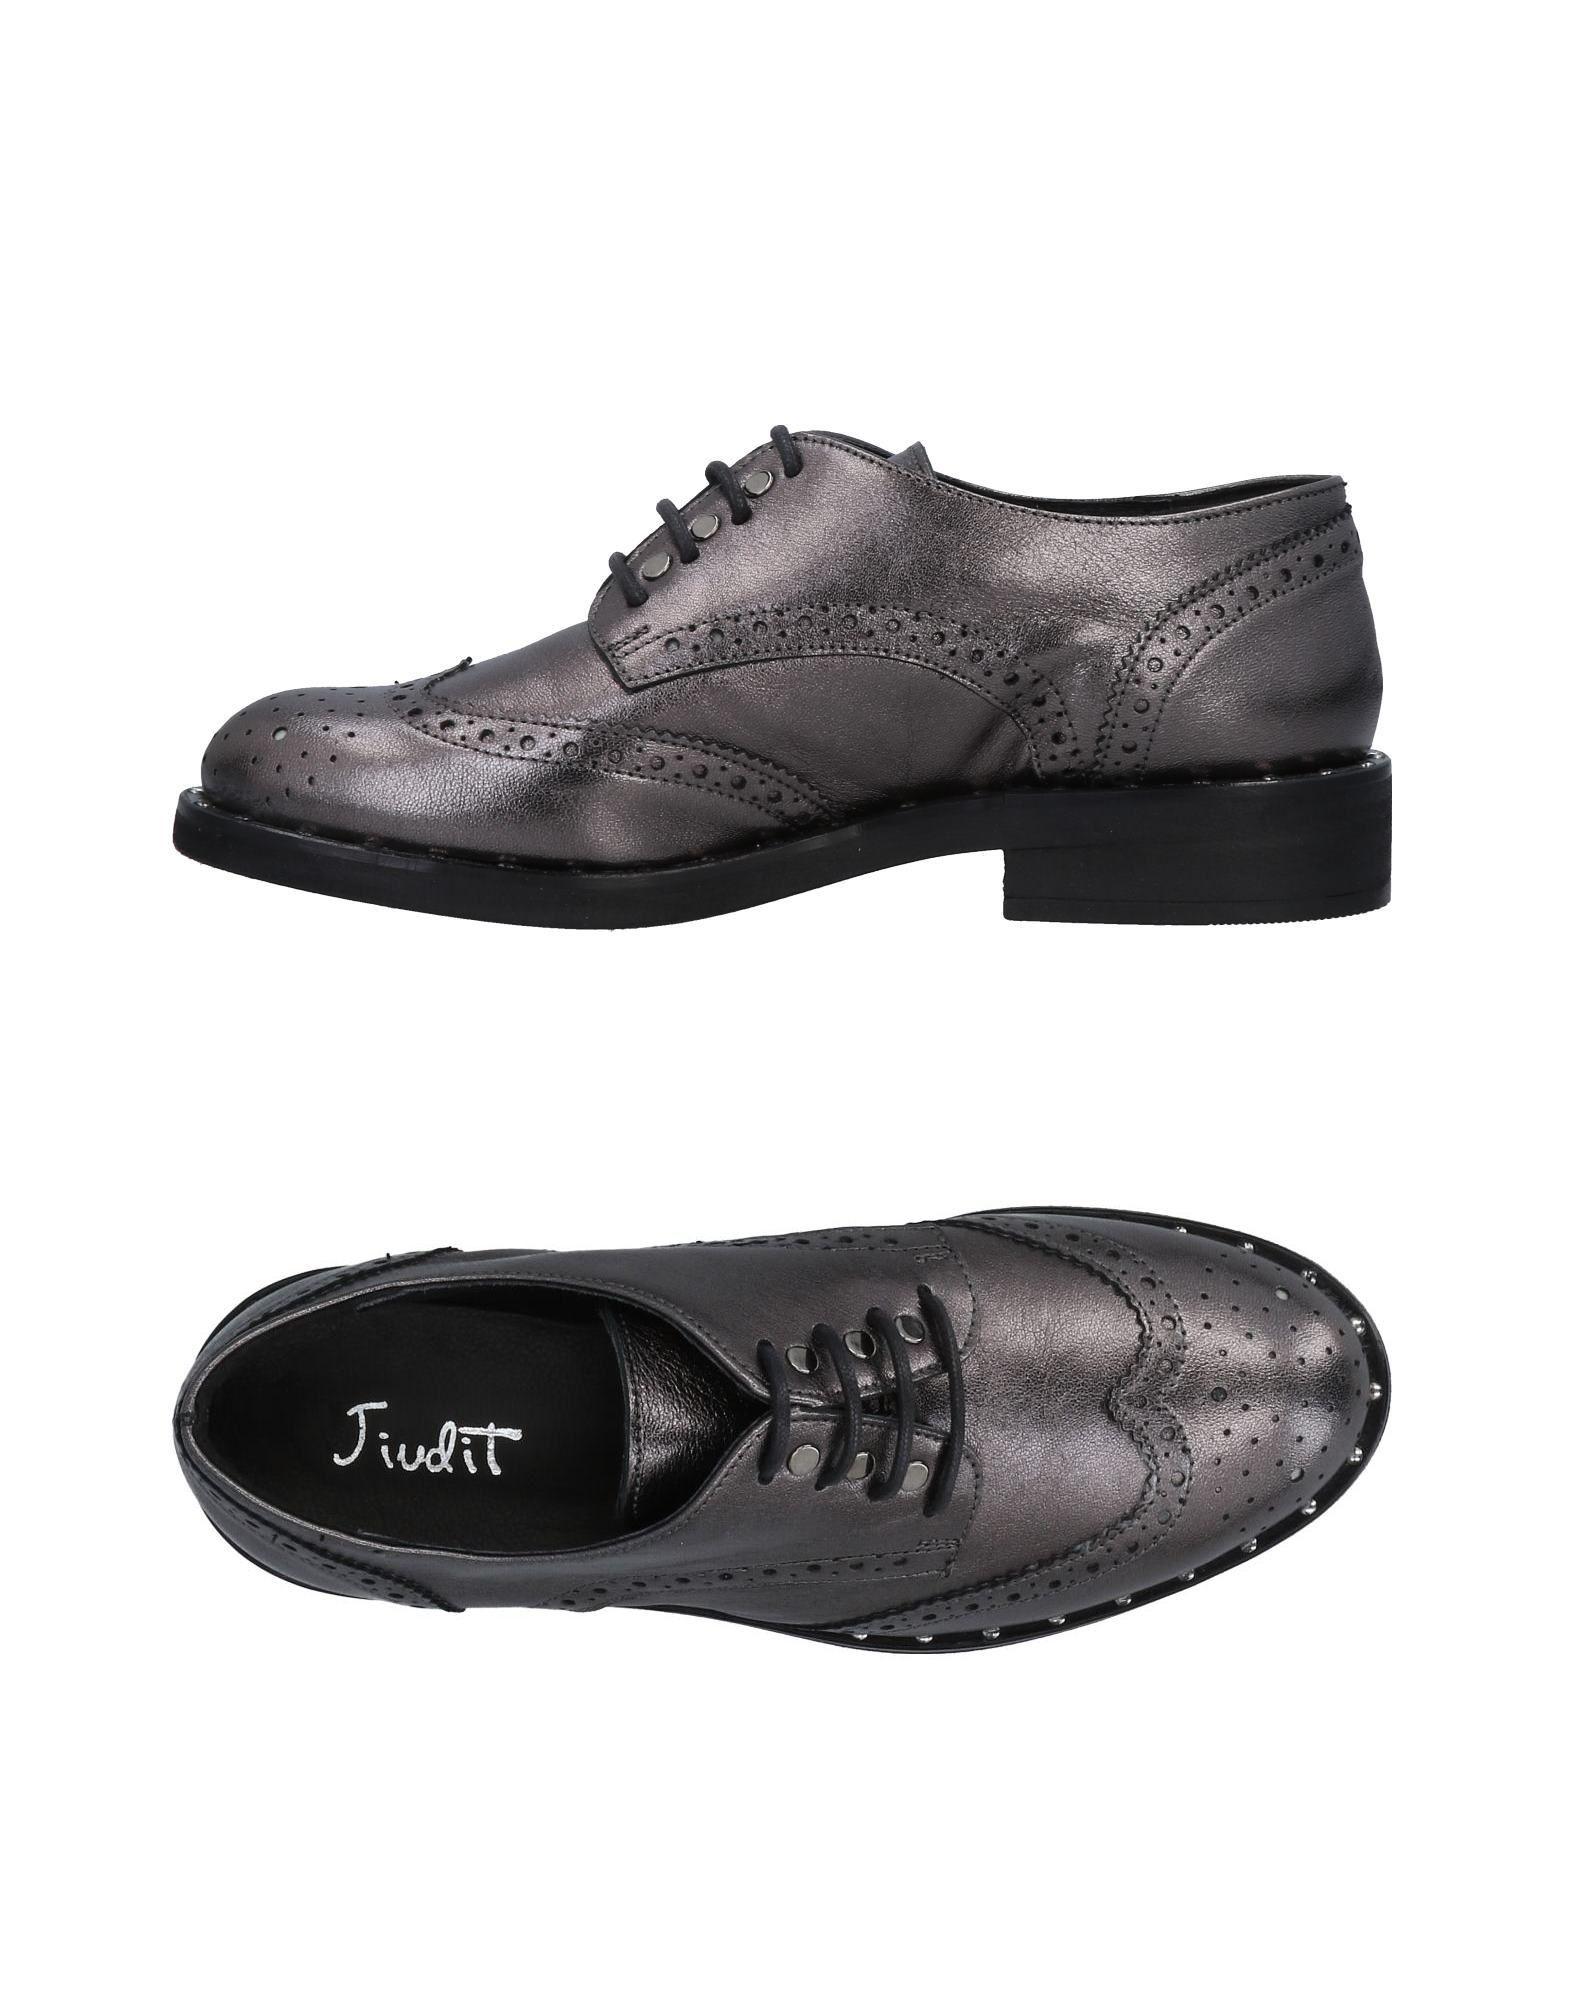 JIUDIT Firenze Обувь на шнурках jiudit firenze мокасины